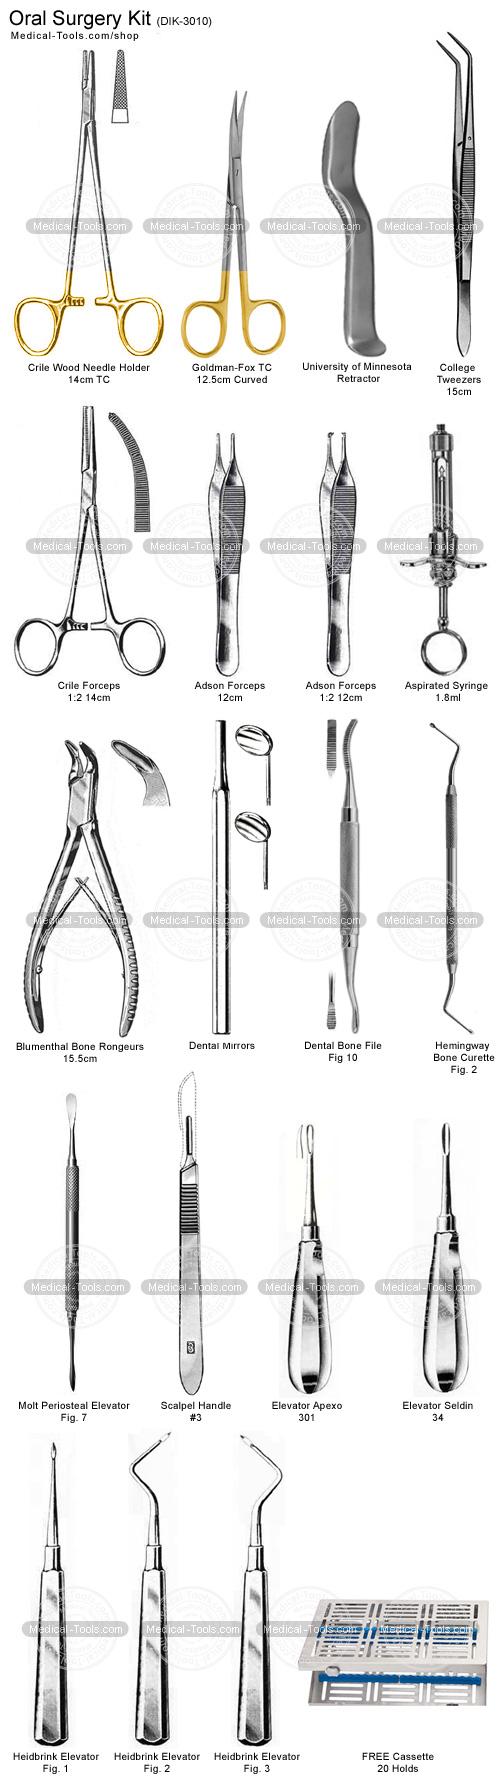 Oral Surgery Kit Dental Instruments Medical Tools Shop